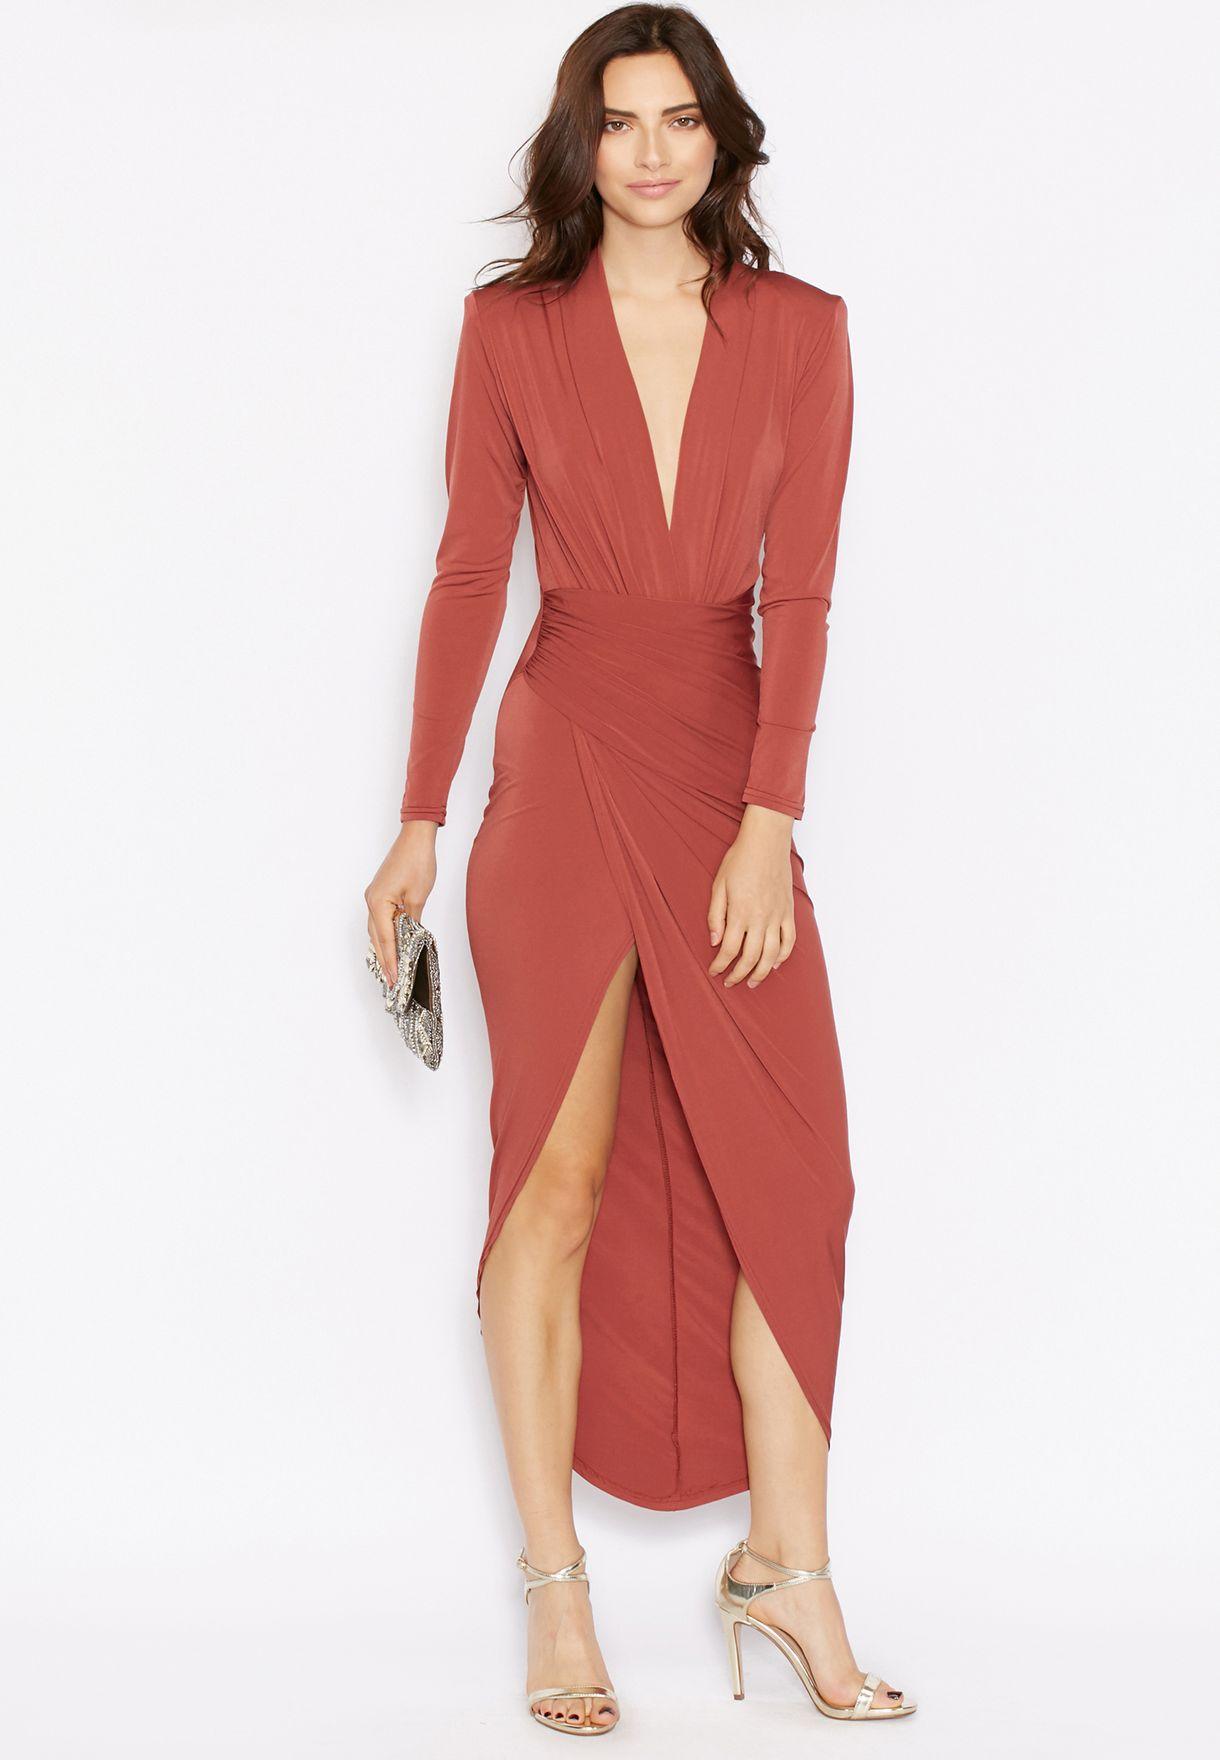 aa21d7c11 Shop John Zack brown Wrap Front Maxi Dress for Women in Kuwait ...